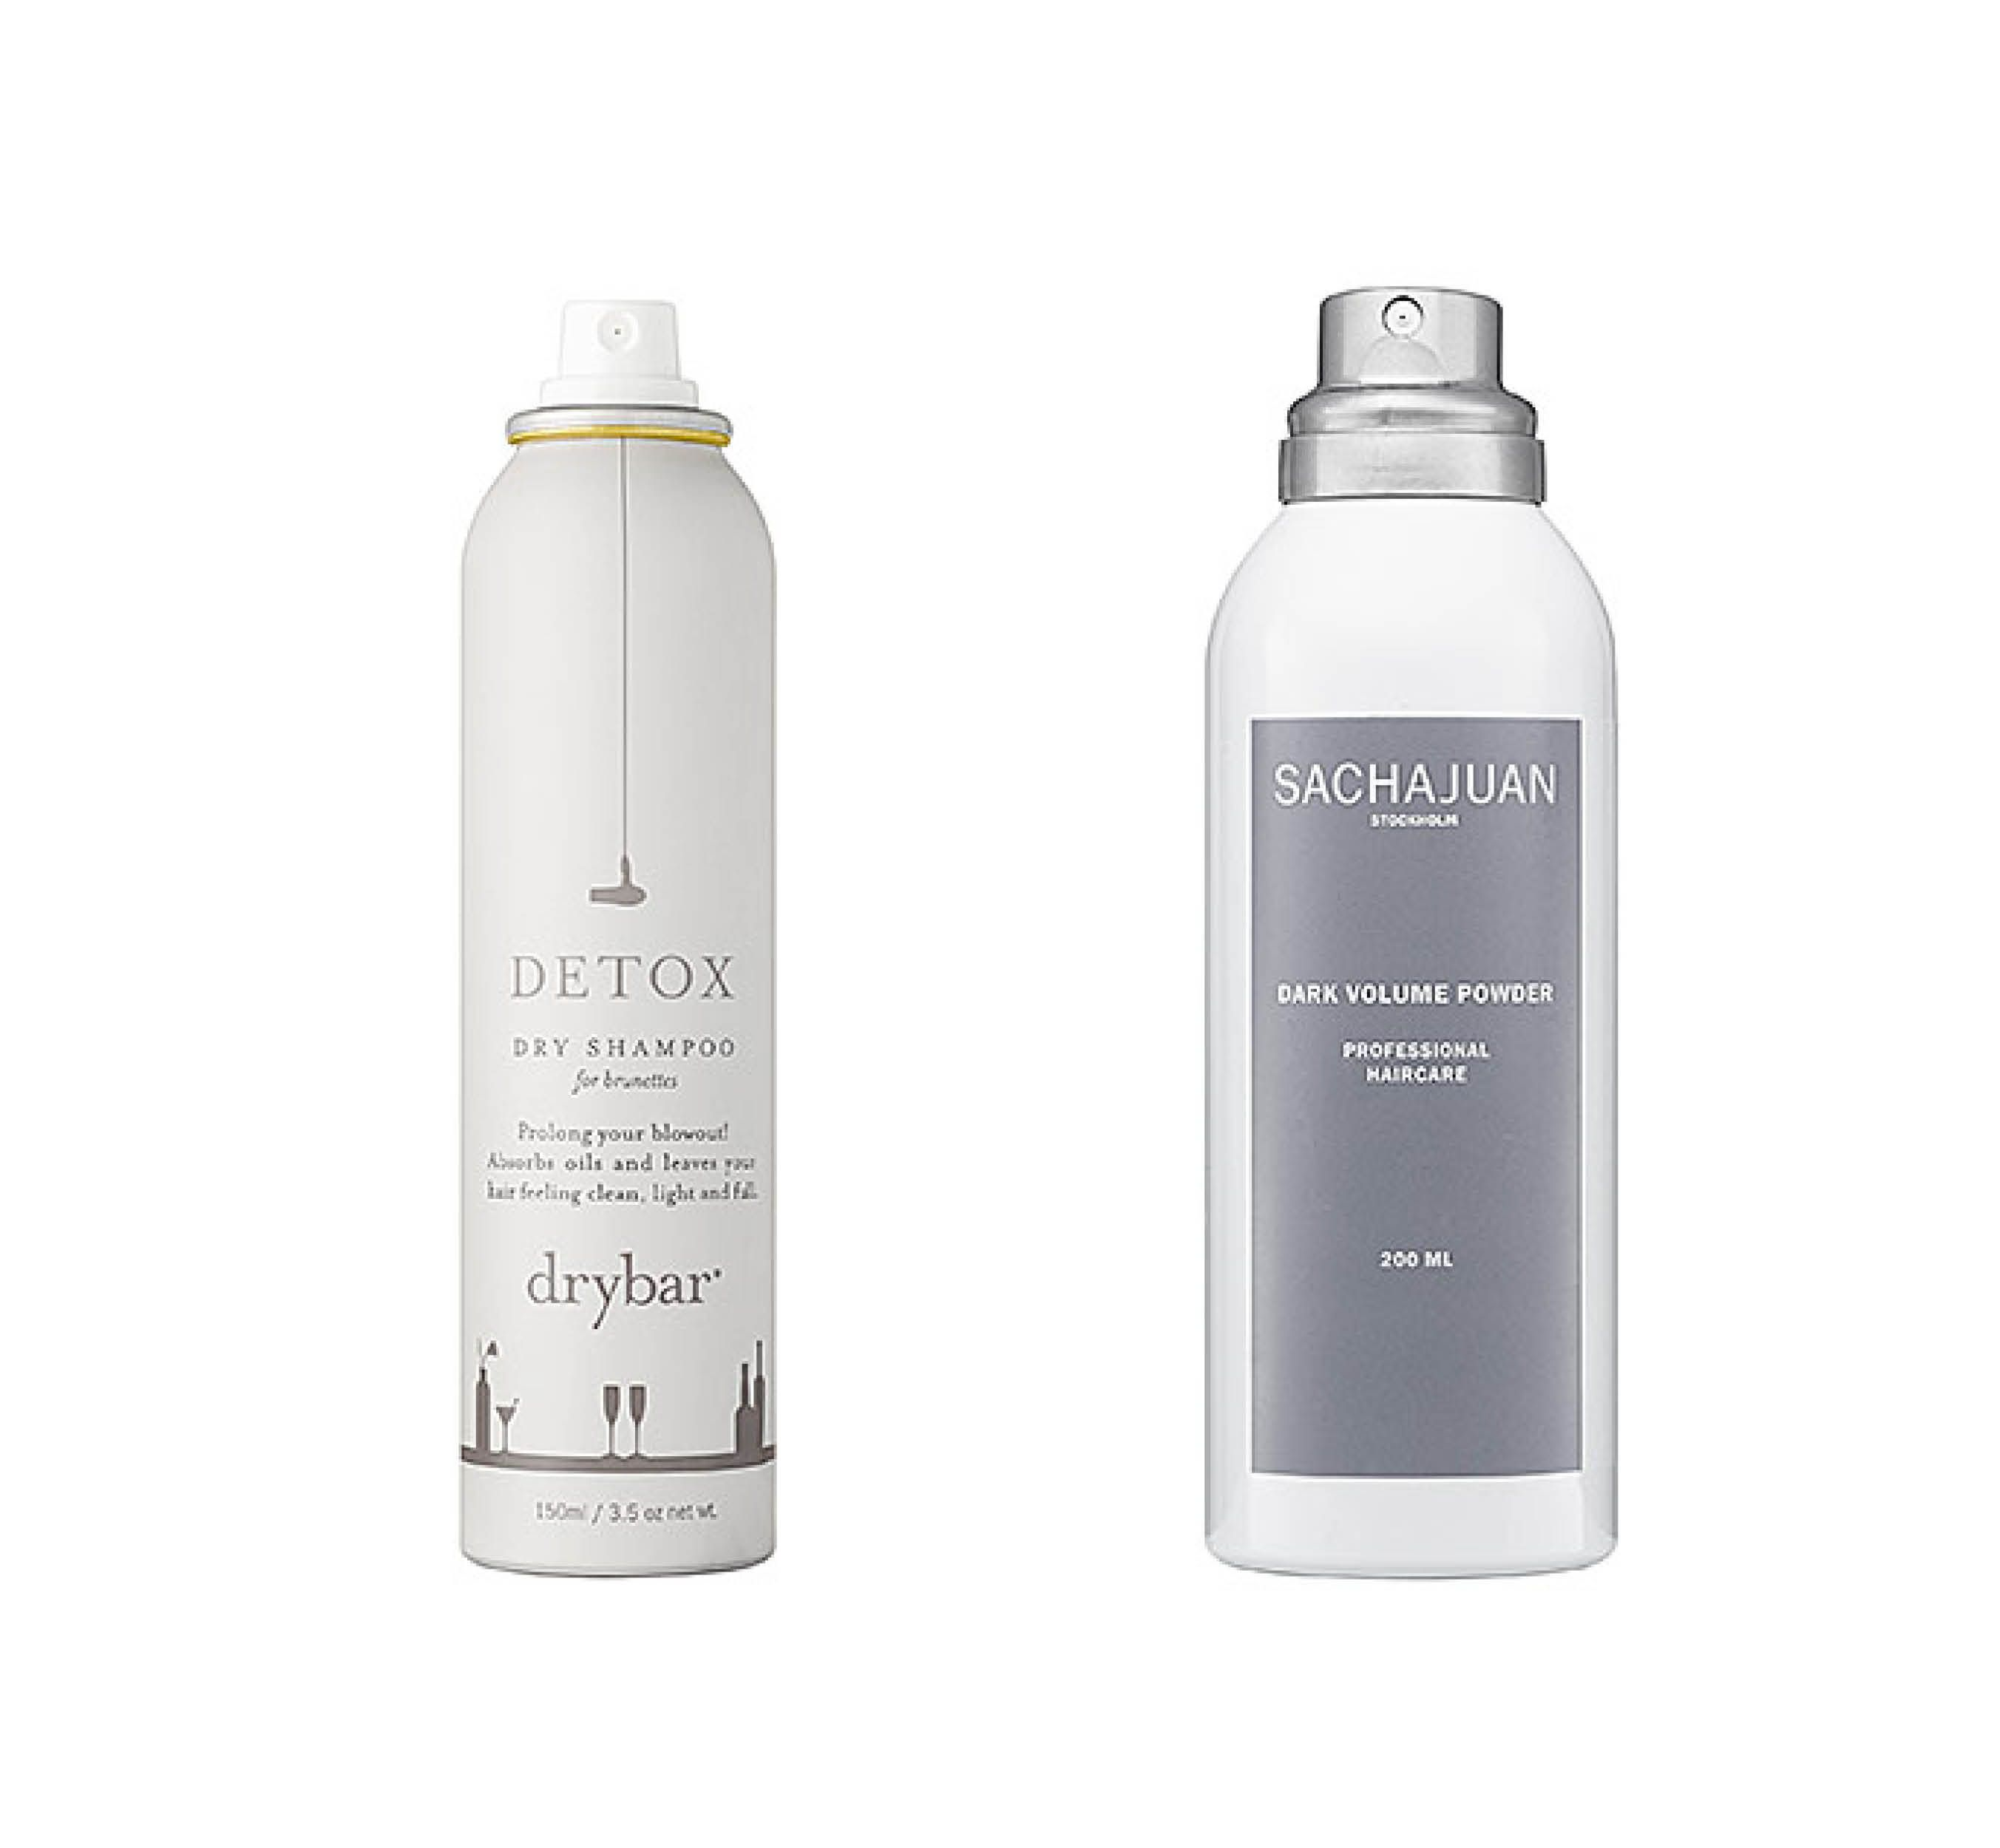 Drybar Detox Dry Shampoo for Brunettes sephoraSachajuan